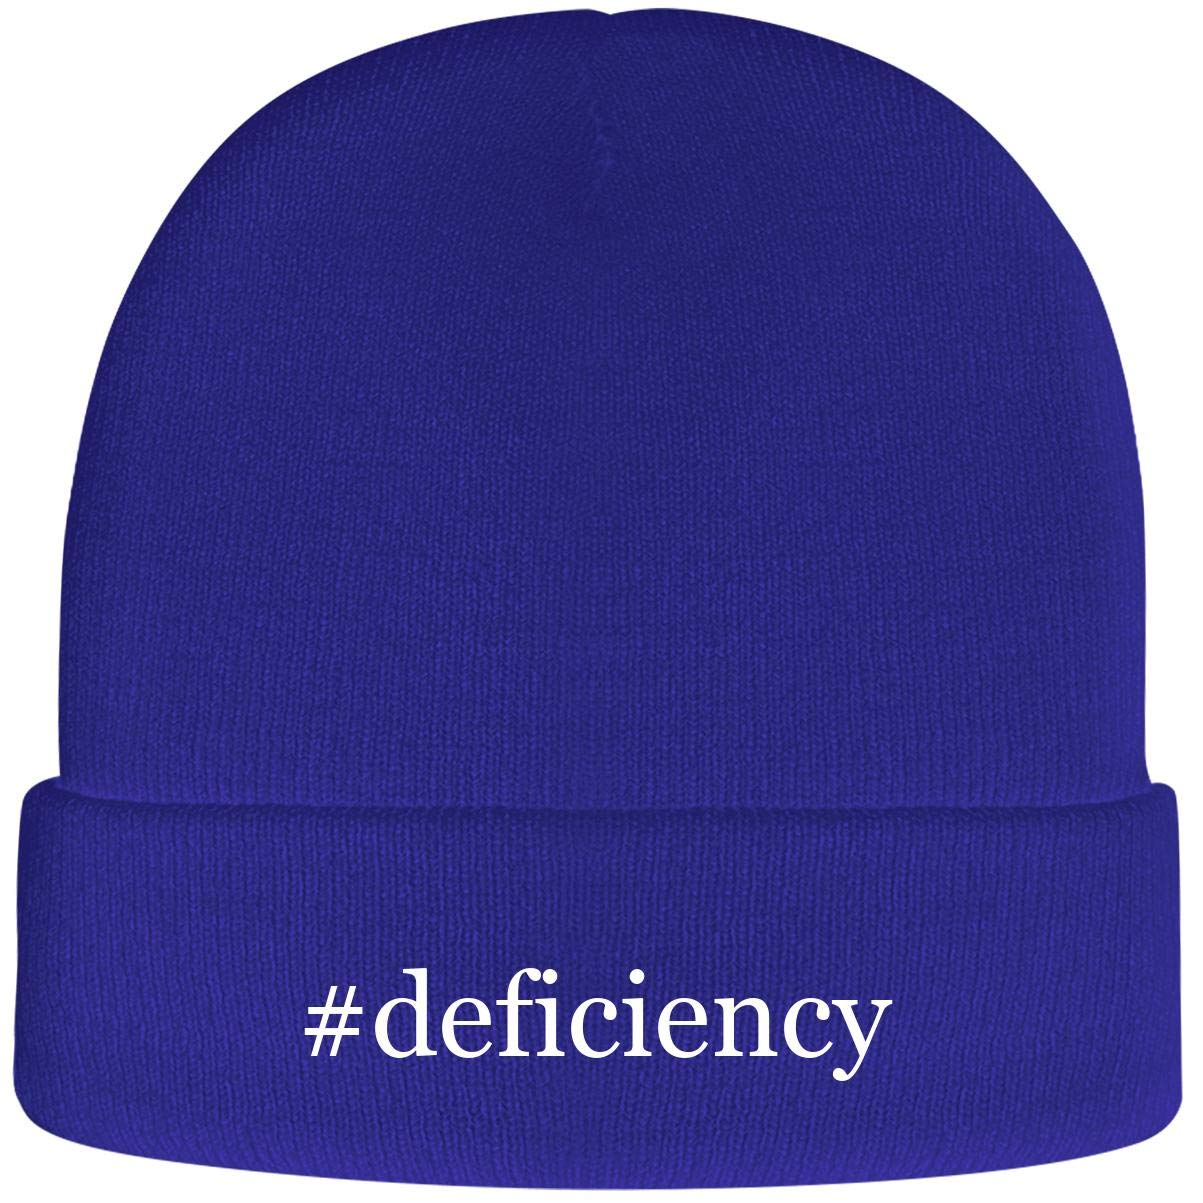 One Legging it Around #Deficiency - Soft Hashtag Adult Beanie Cap